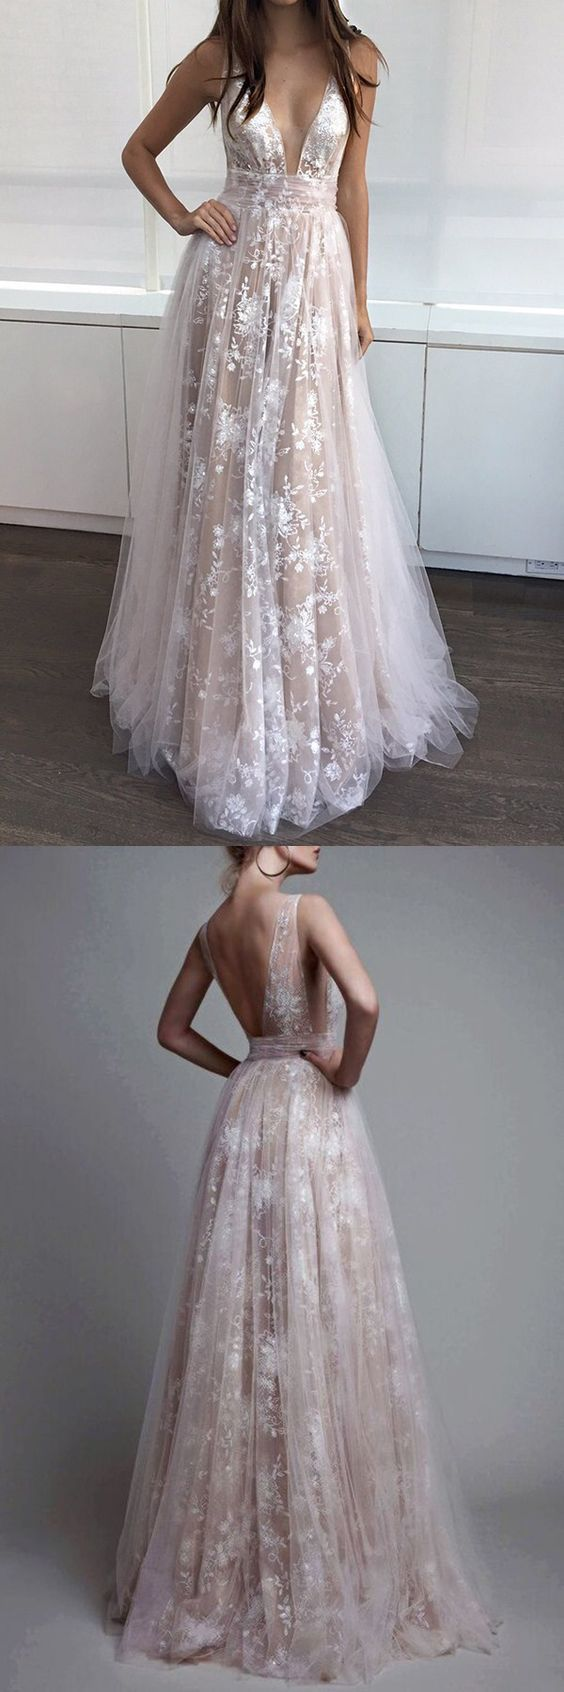 Champagne A-Line V-Neck Appliques Long Prom Dress